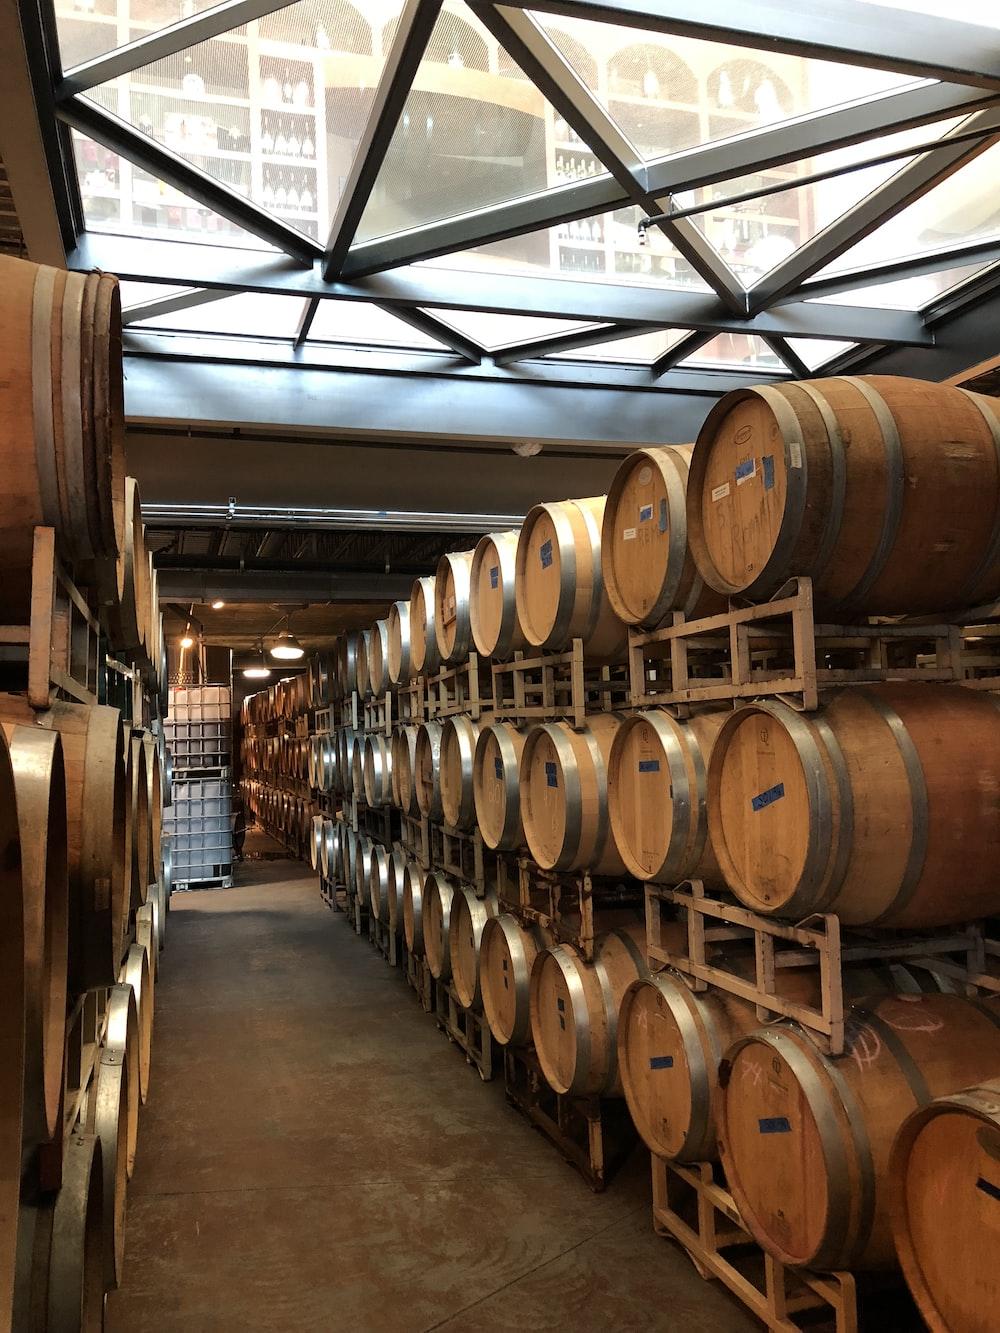 brown wooden barrels in a room